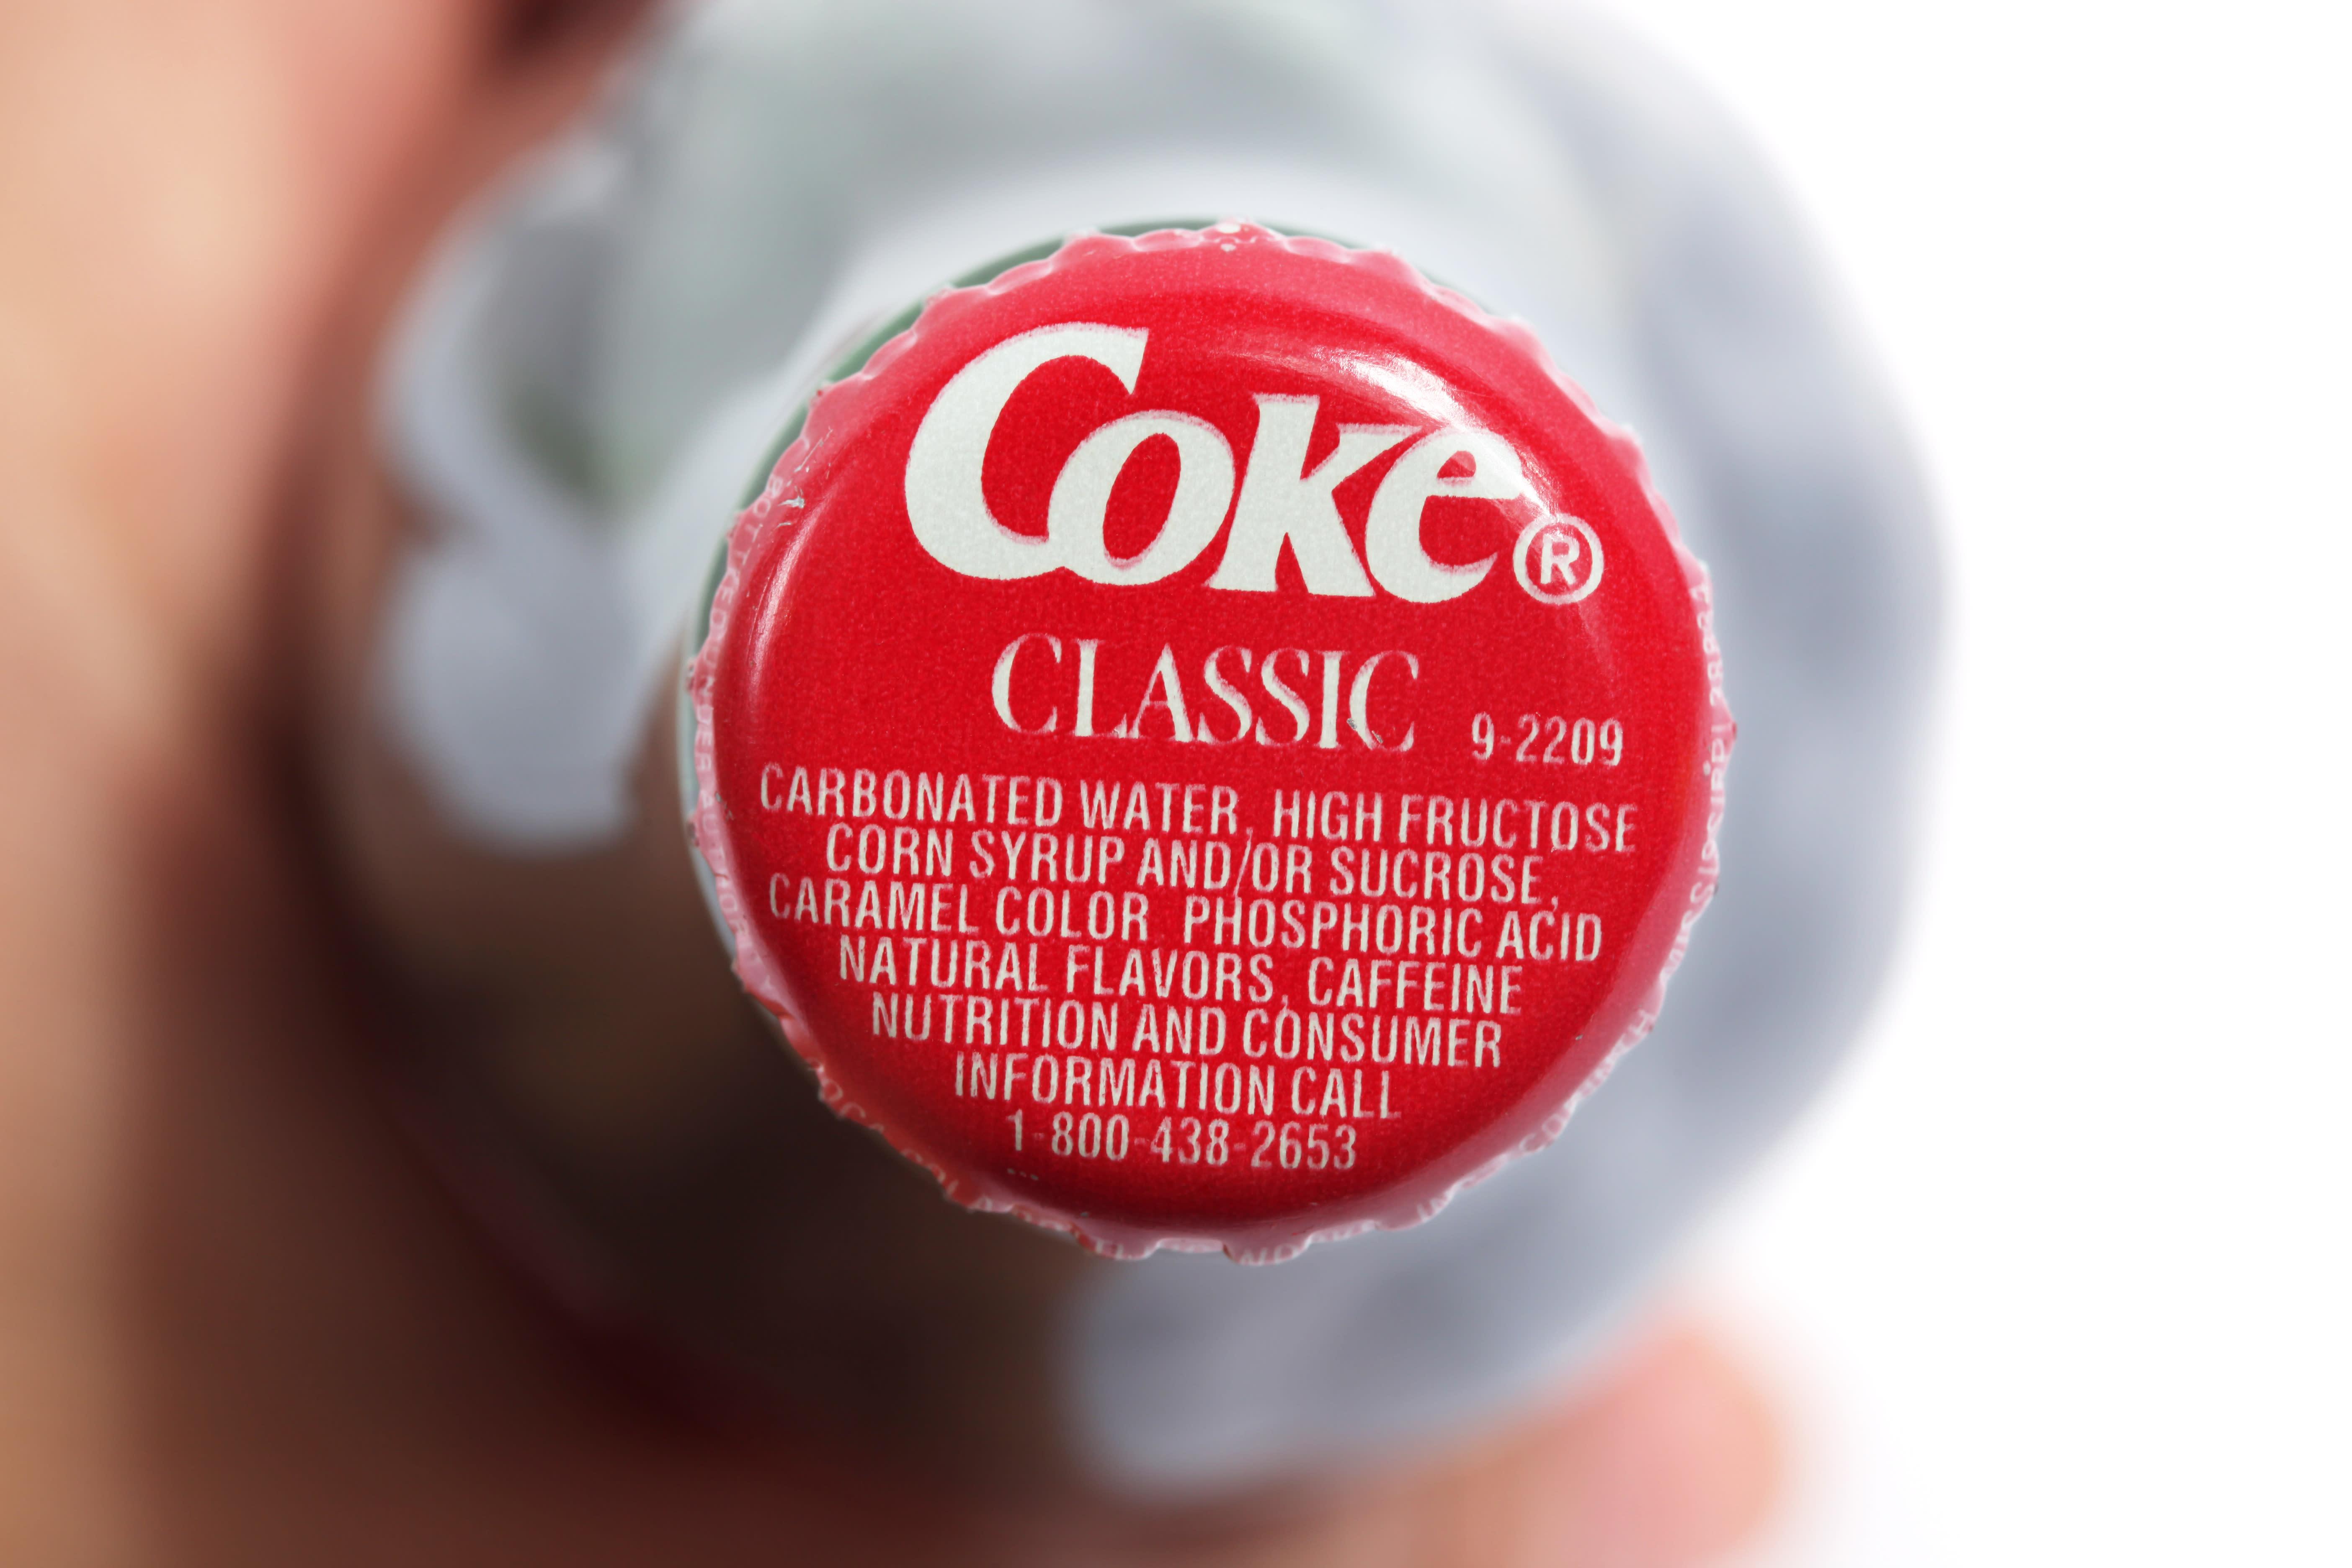 Coke beating earnings raises revenue forecast for the beverage company